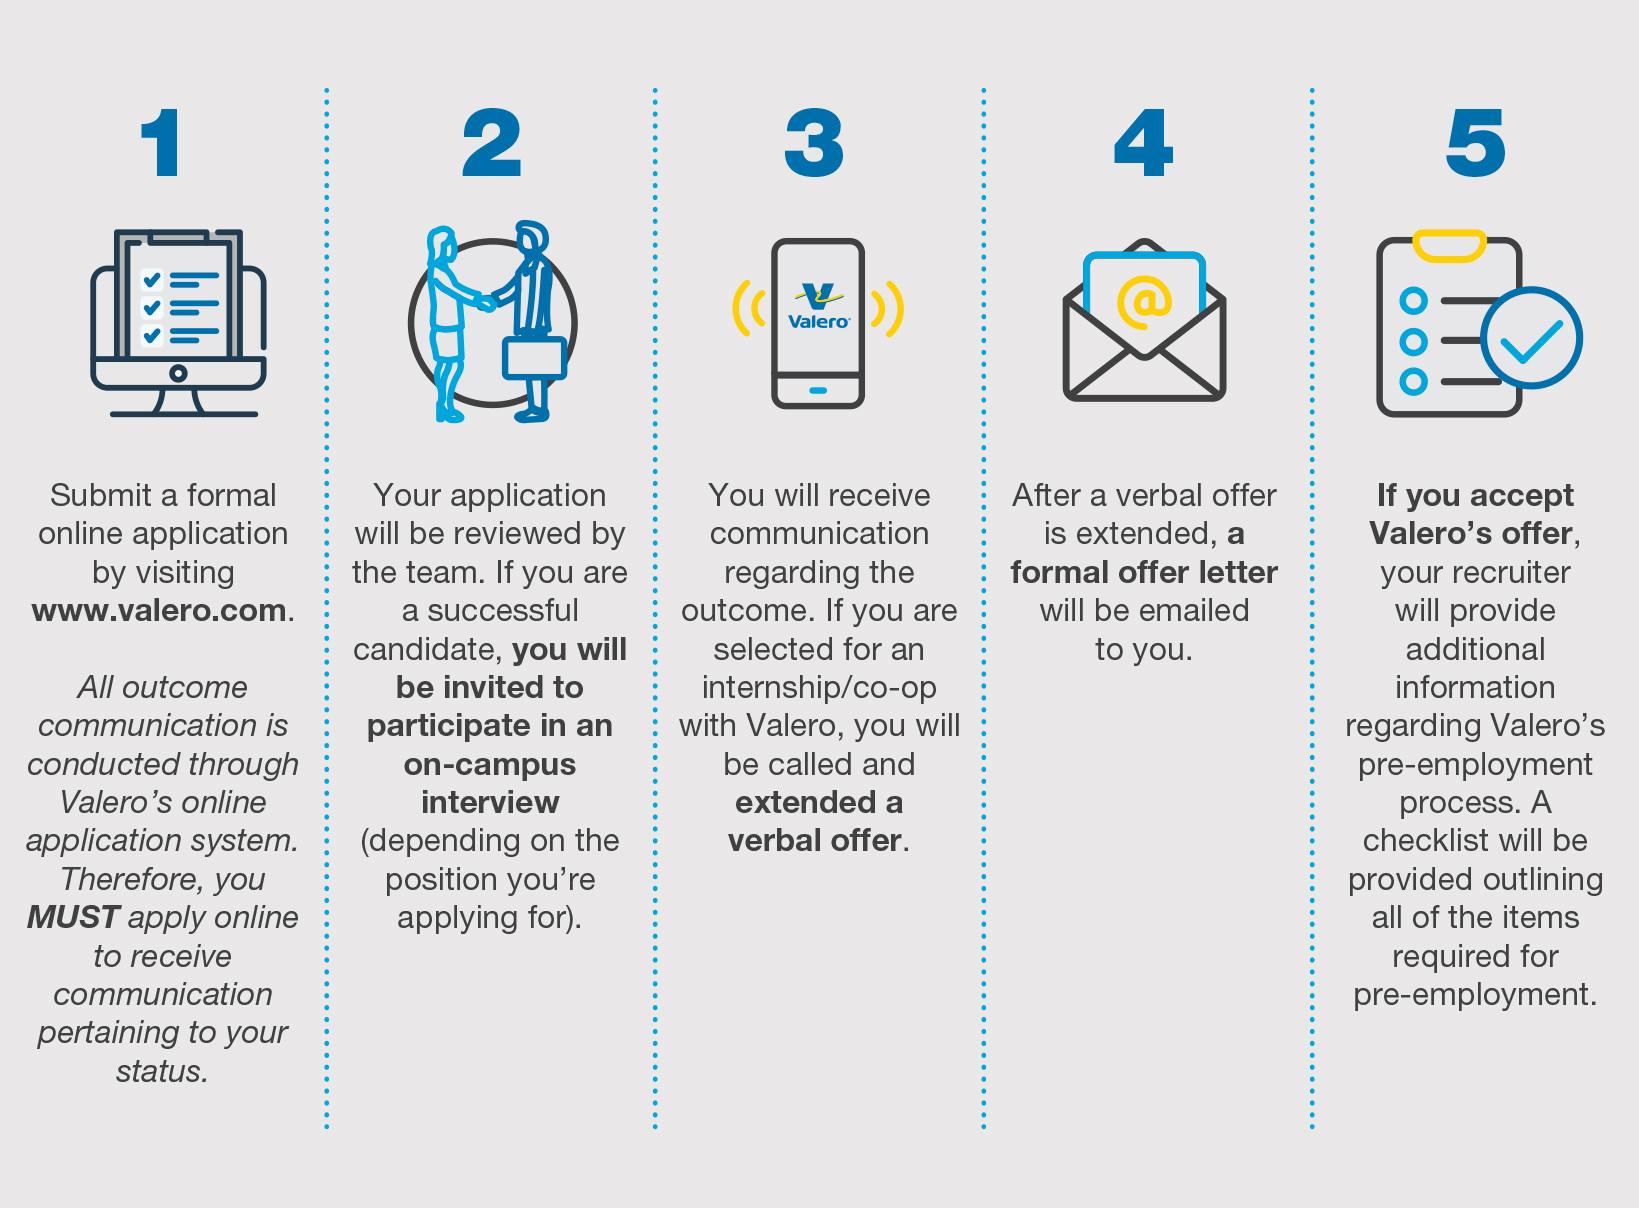 Valero Intern Application Process Infographic